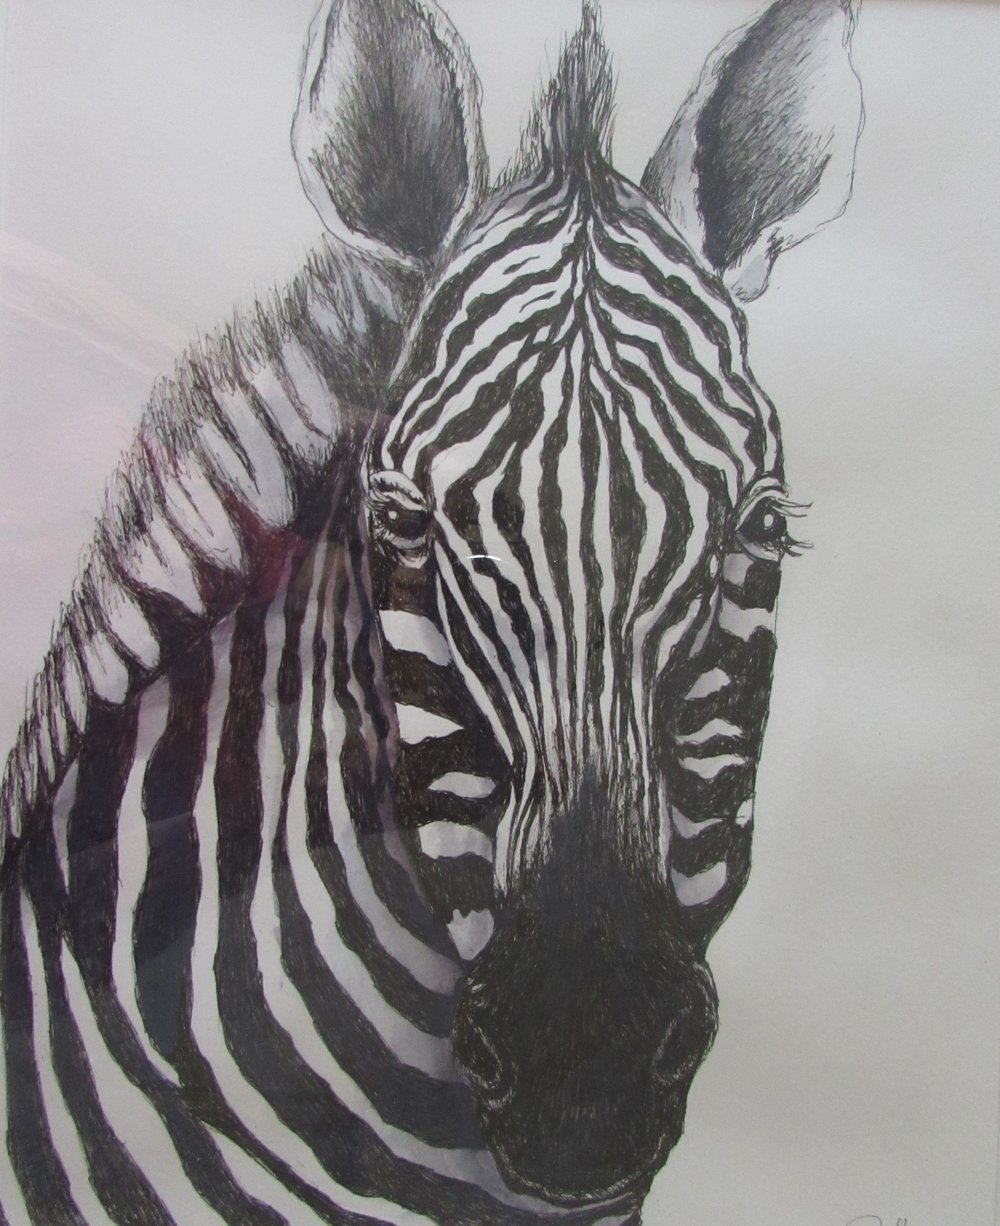 Zebra wc